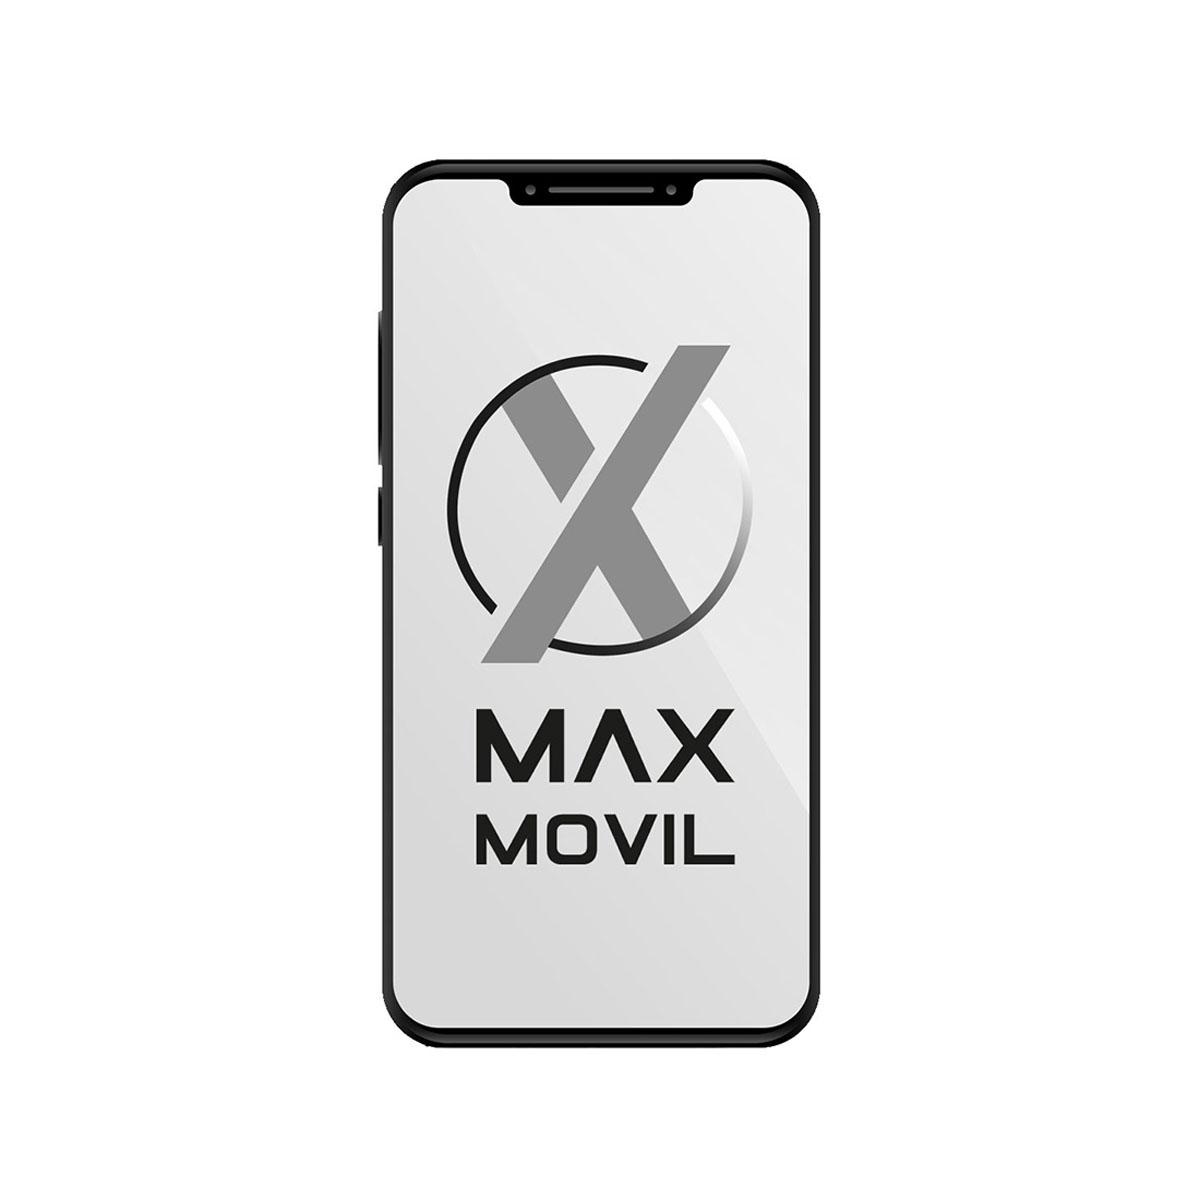 Catalogo Valeo parking sensor 2018 Comprar Online Barato · MaxMovil ⓴⓲